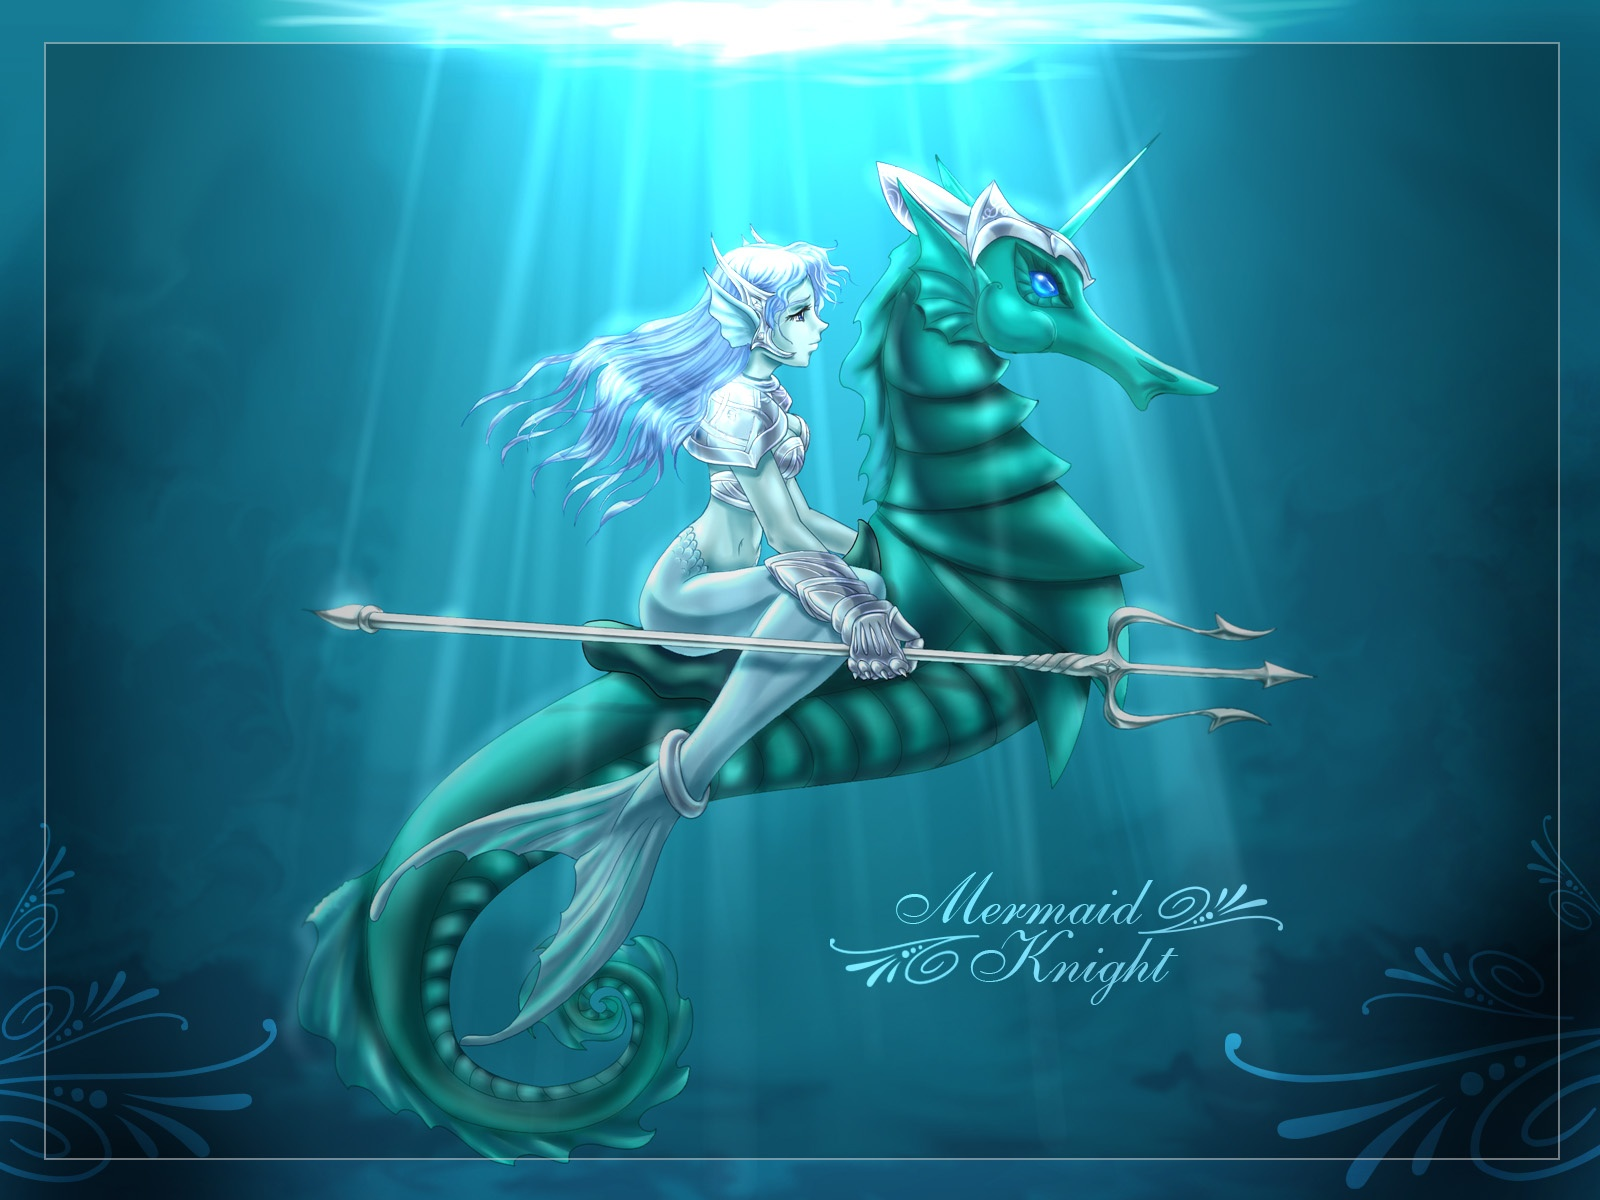 [49+] Anime Mermaid Wa...